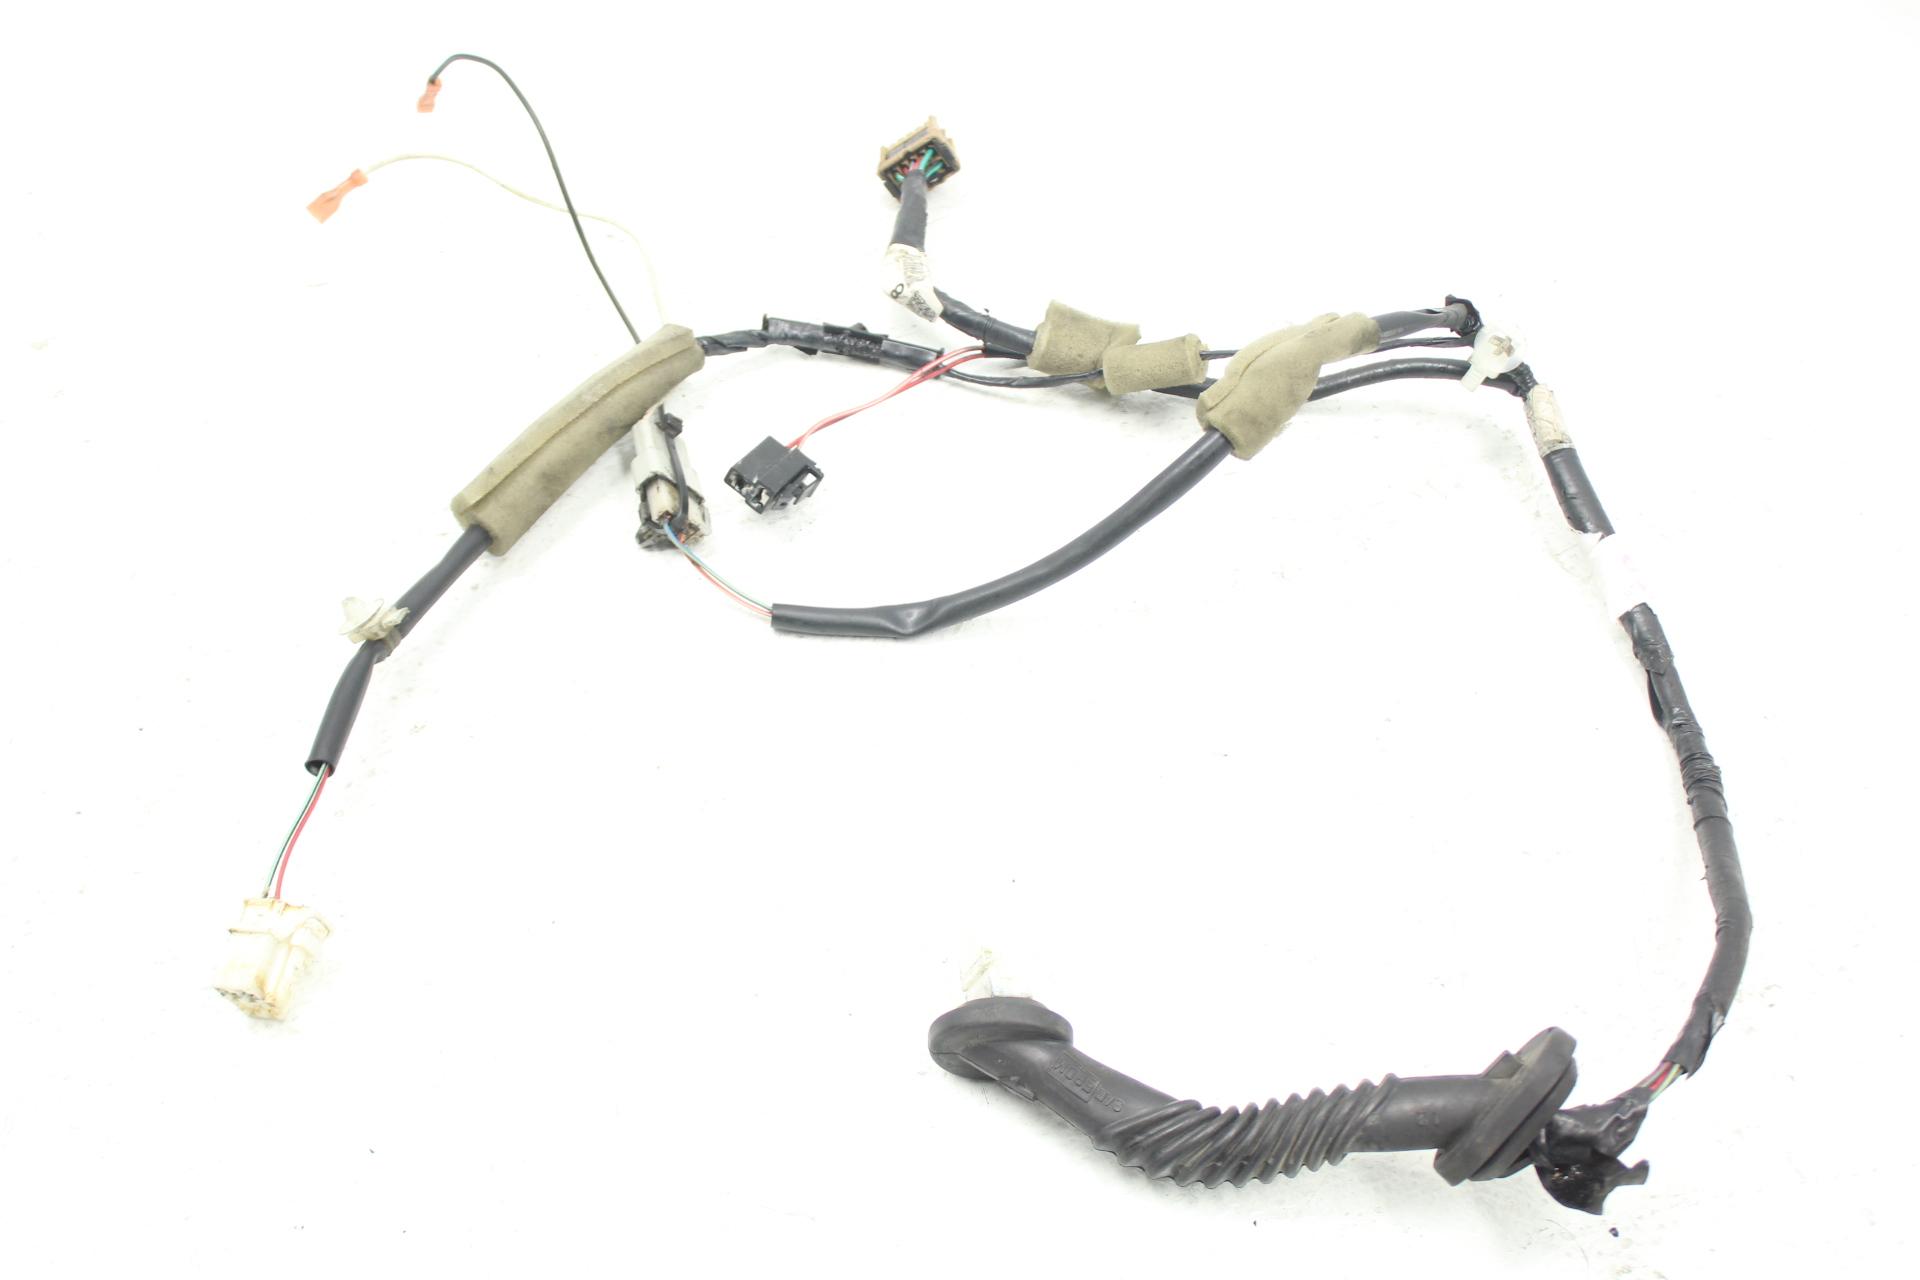 02 04 Subaru Wrx Amp Sti Rh Rear Door Wire Wiring